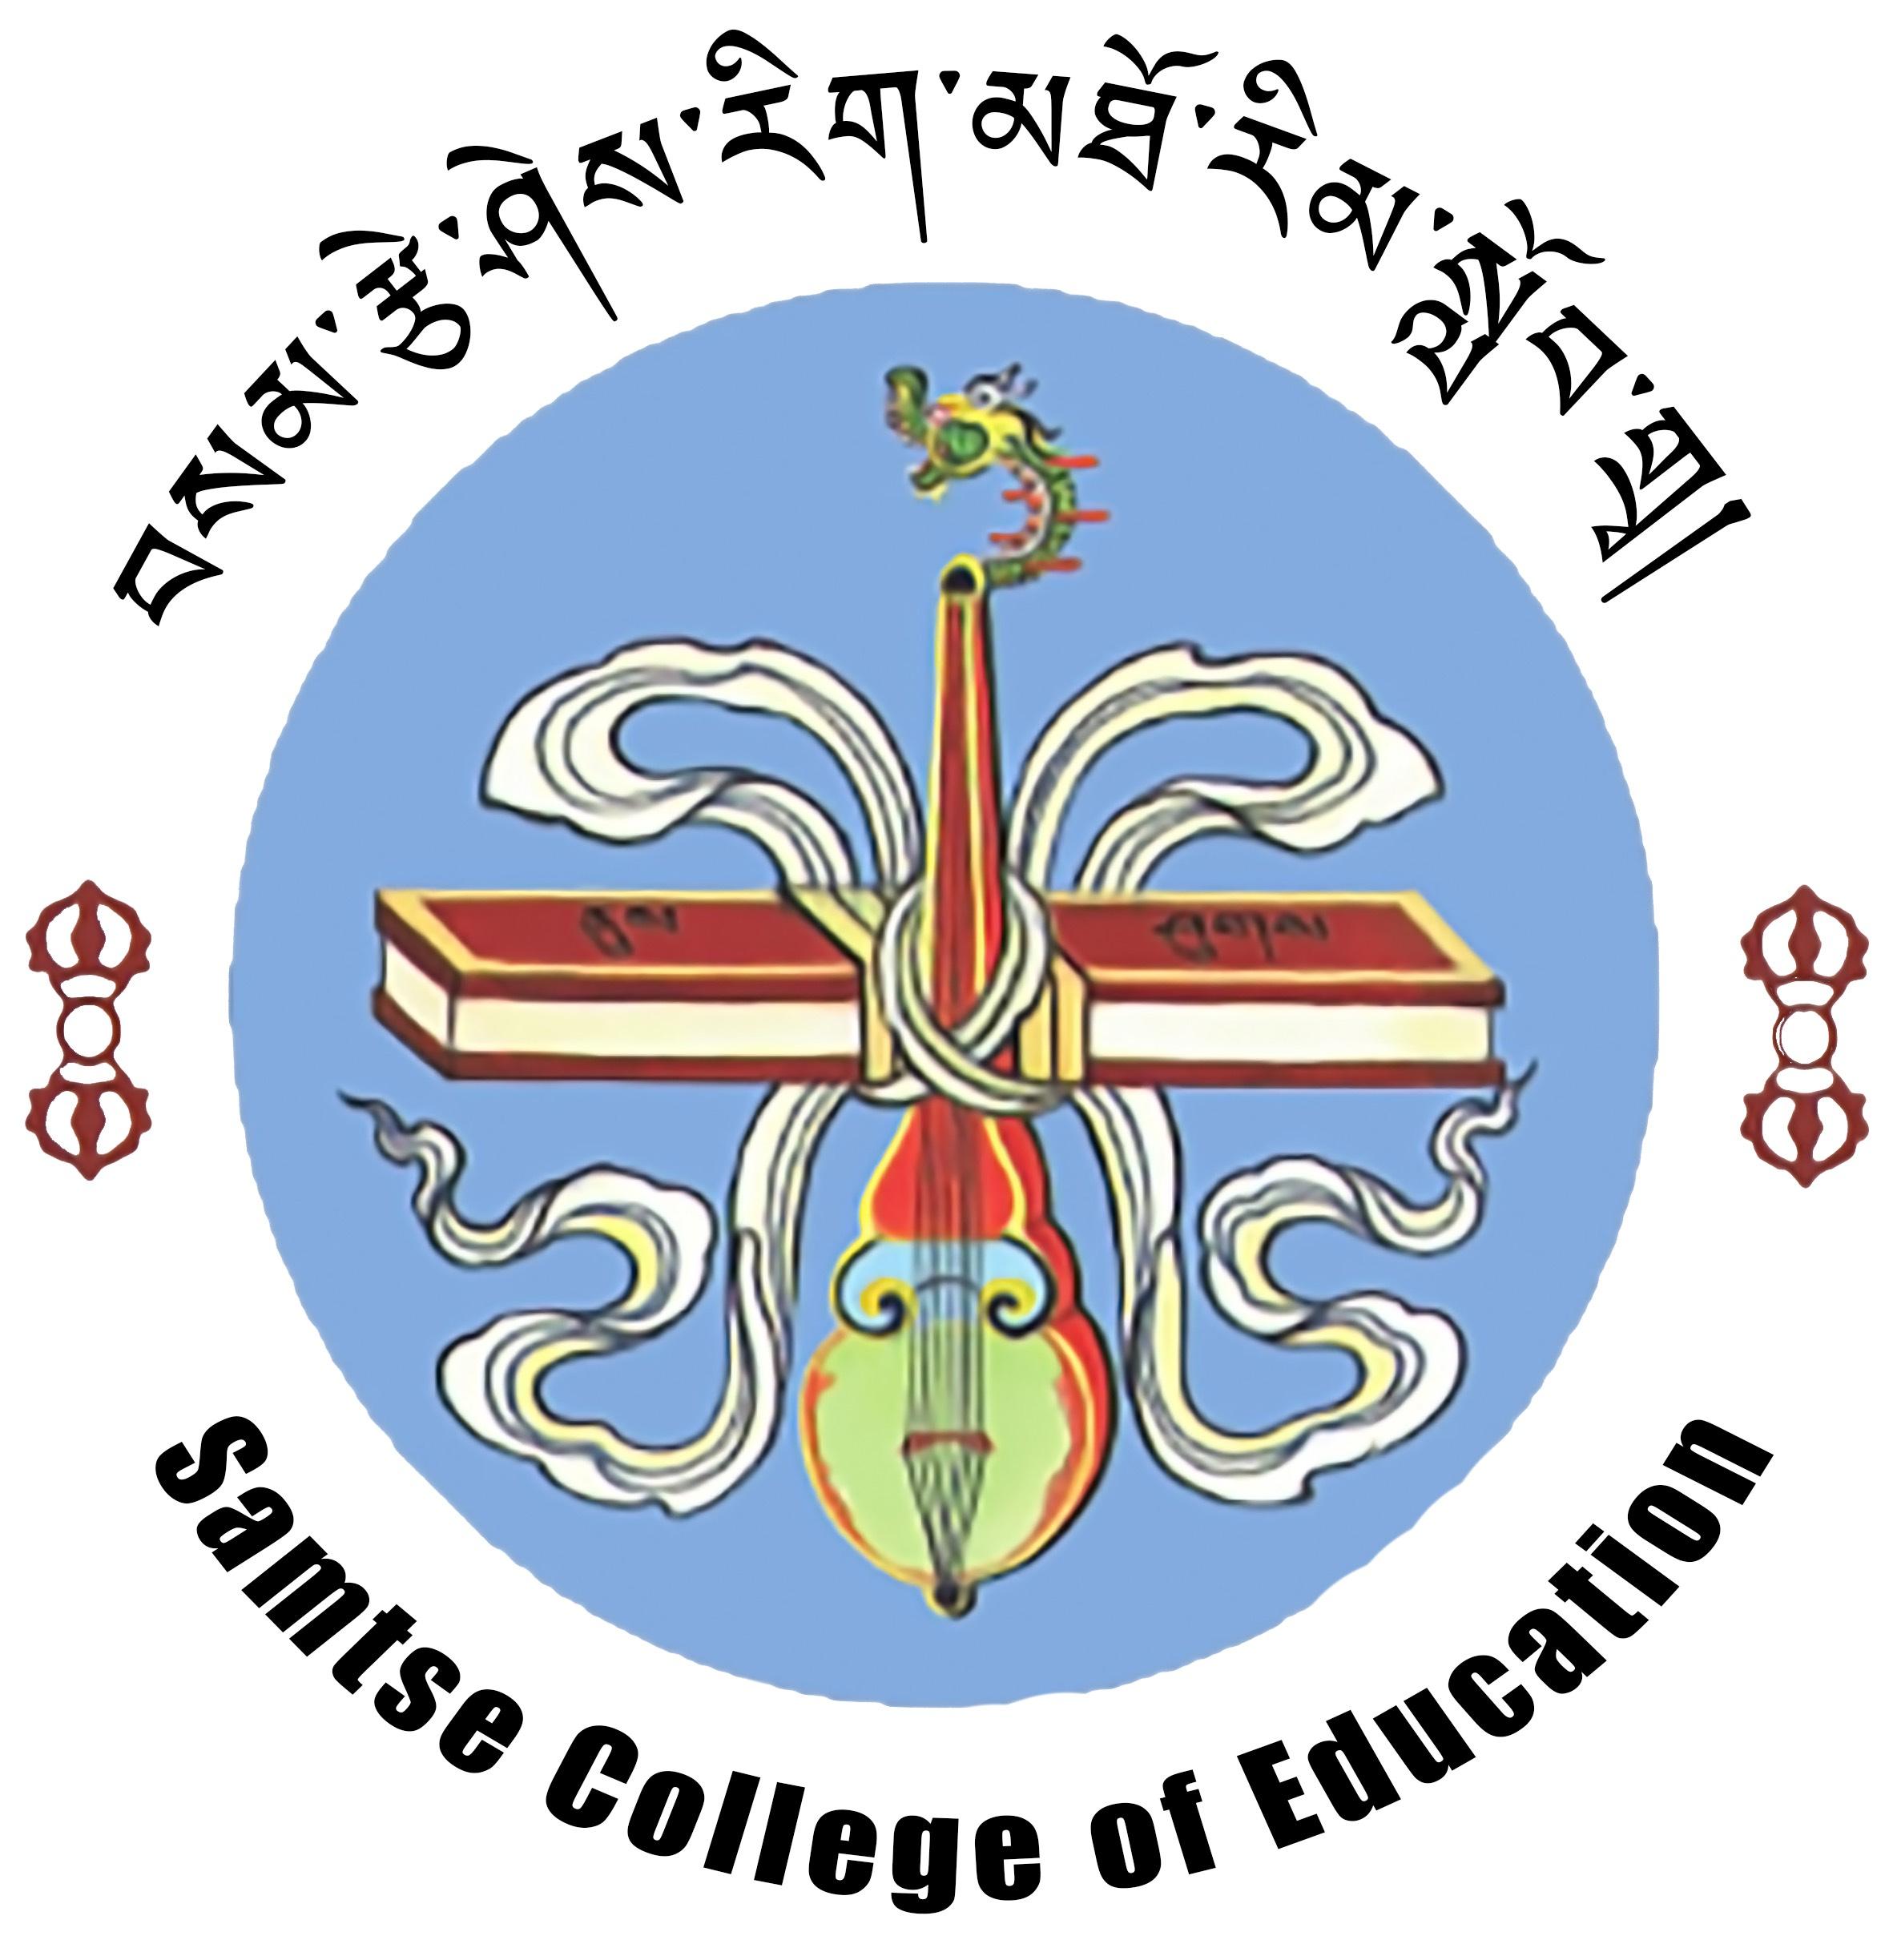 Samtse College of Education